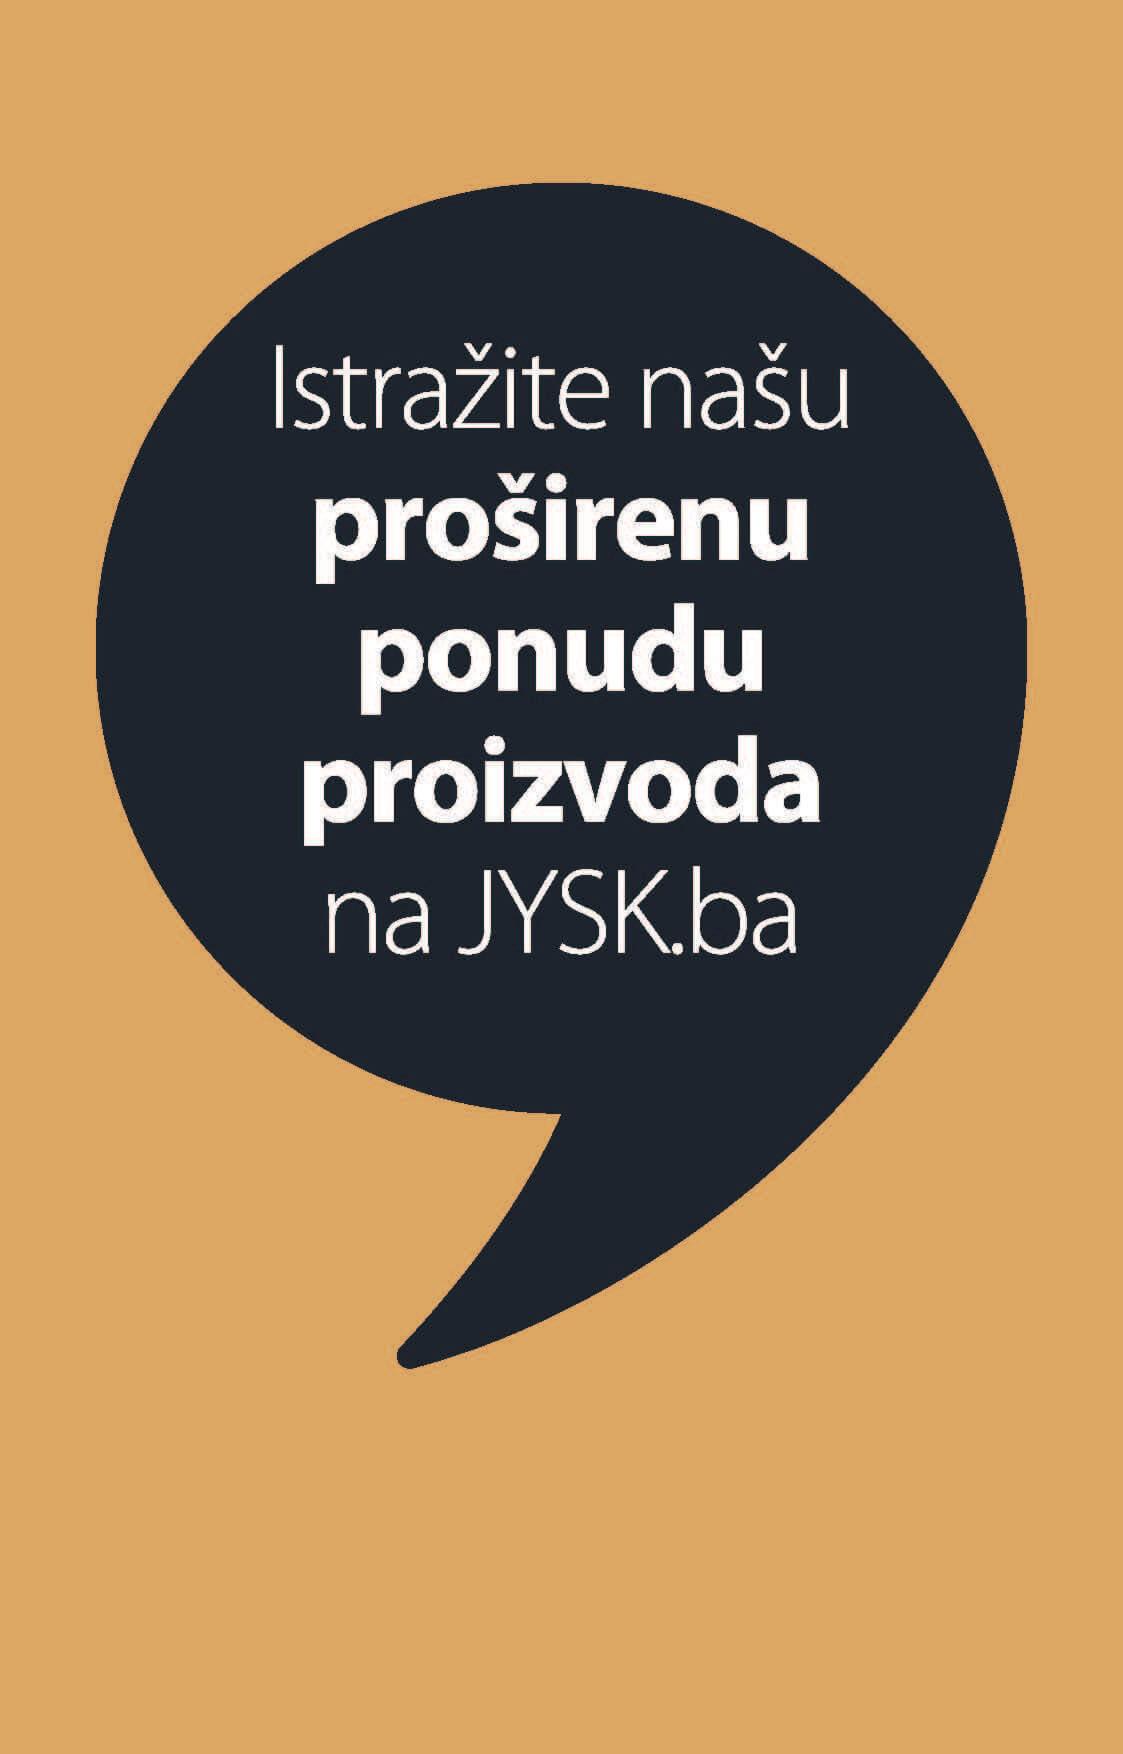 JYSK Katalog Akcijska ponuda MAJ 13.05.2021. 26.05.2021 ekatalozi.com Page 01